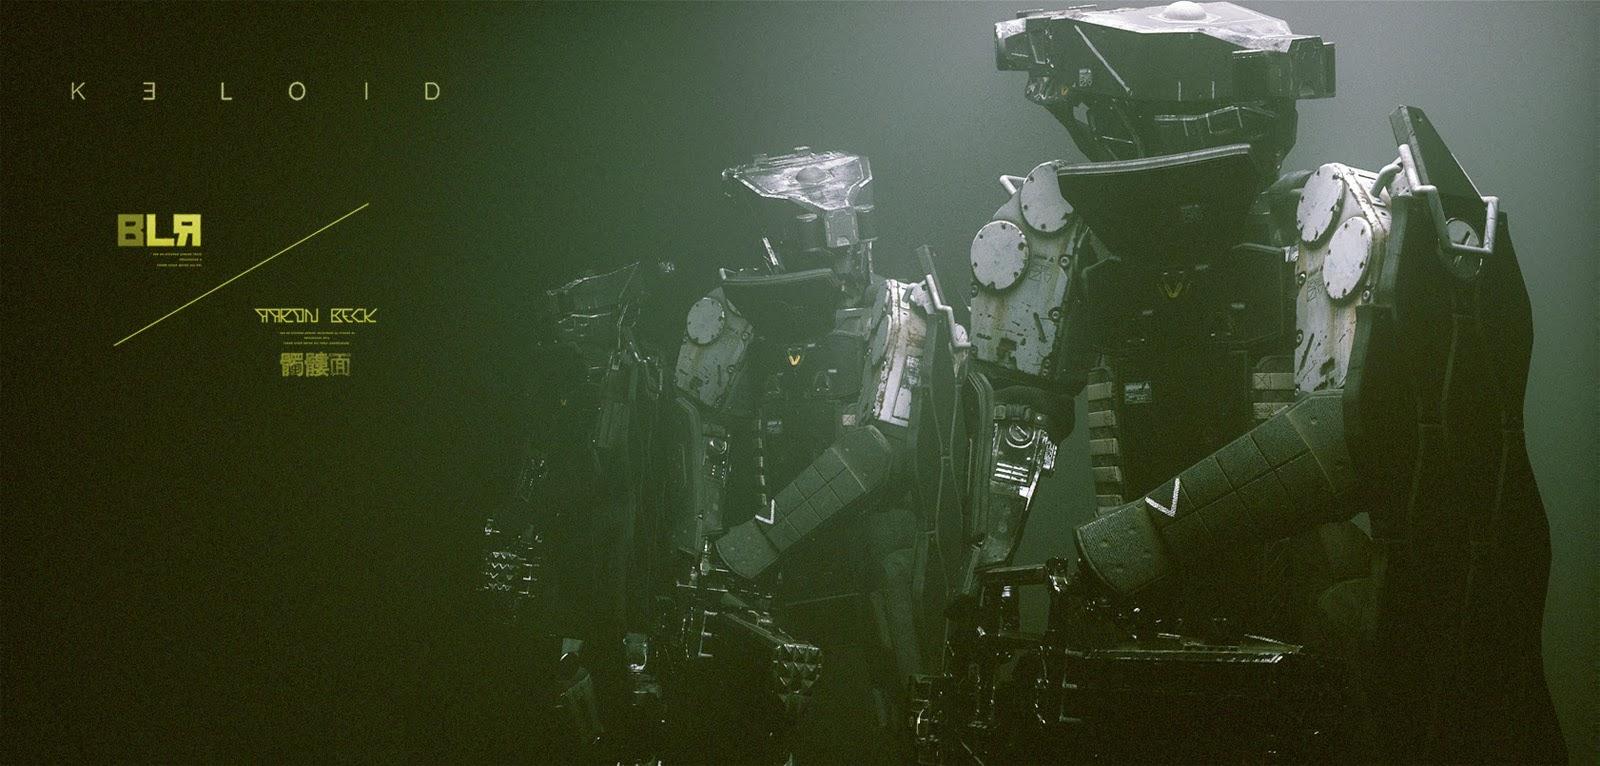 God Animation Wallpaper Keloid Trailer 2 Big Lazy Robot Aaron Beck The